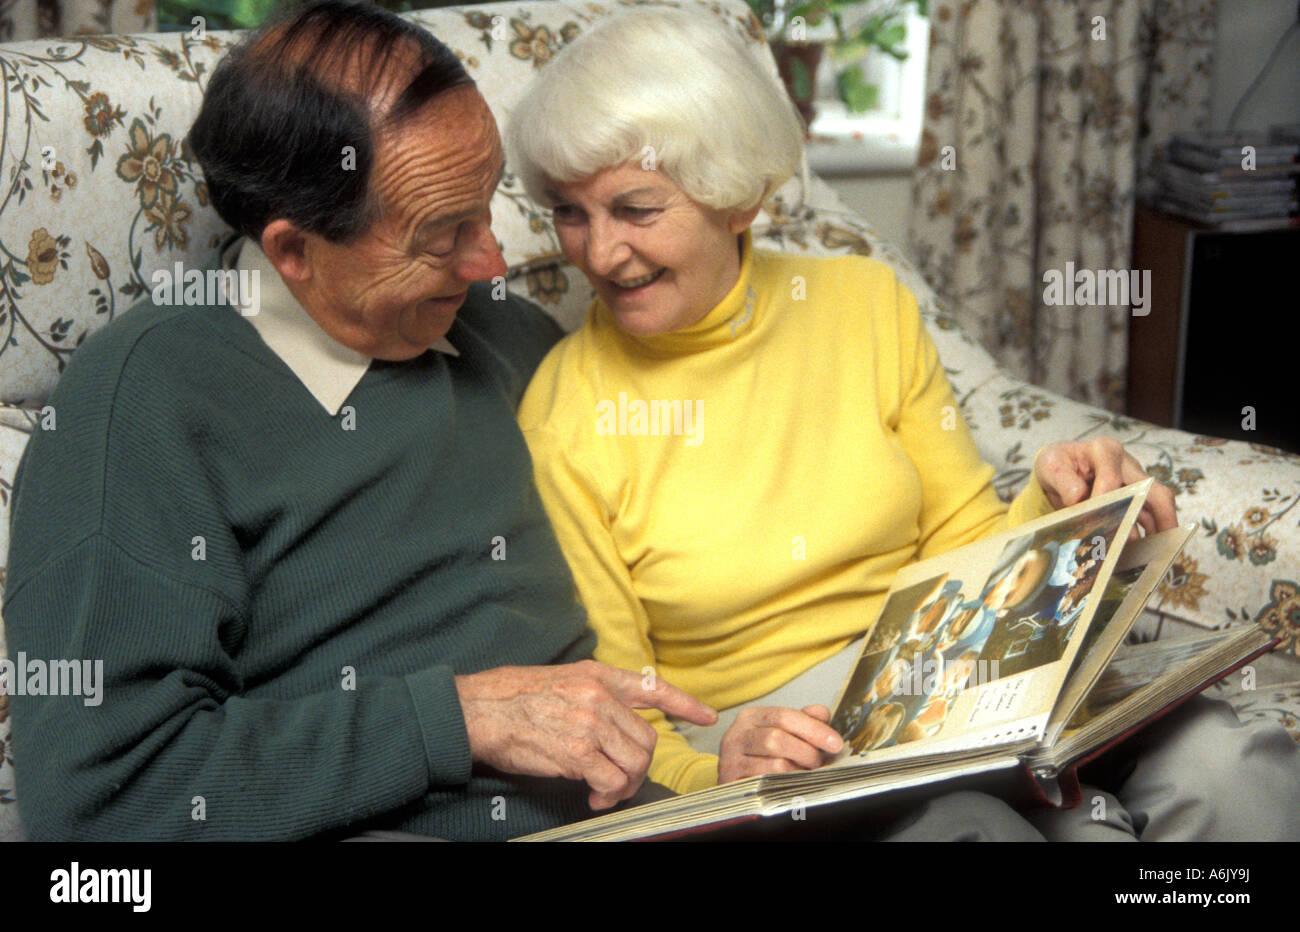 loving elderly couple sitting on sofa at home looking through photo album - Stock Image